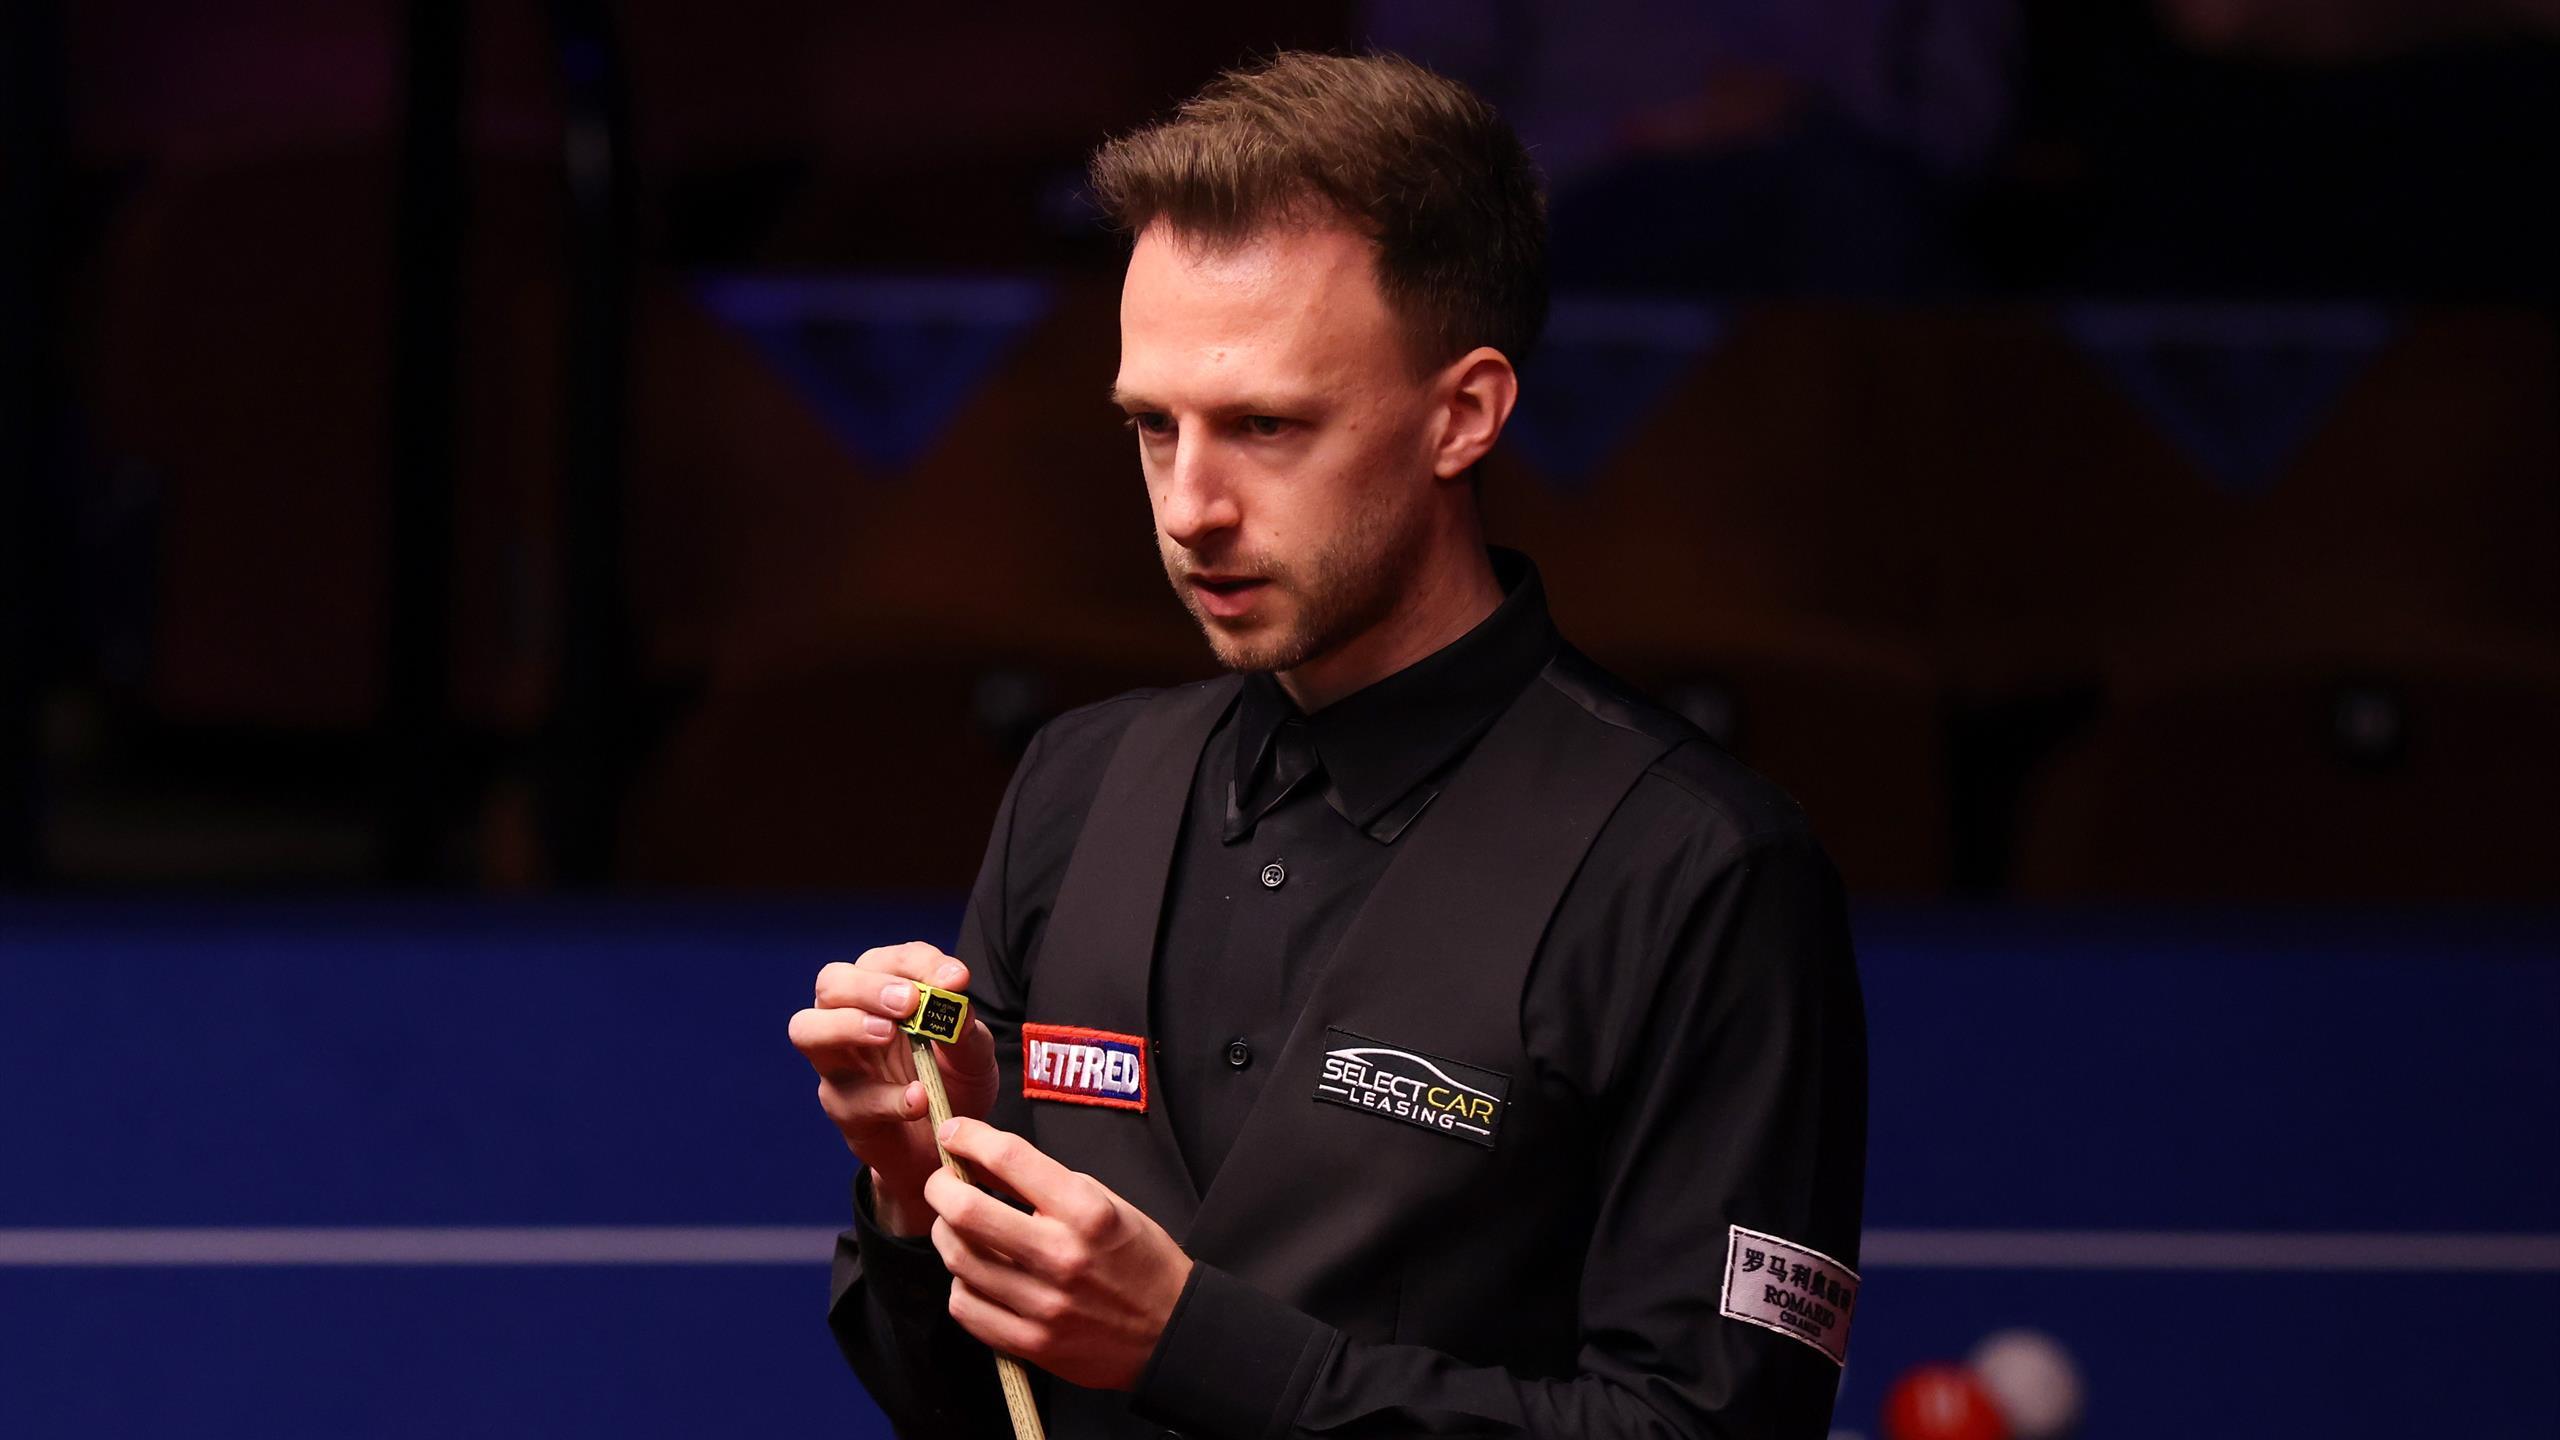 Championship League snooker 2021: 'I wasn't fluent' - Judd ...